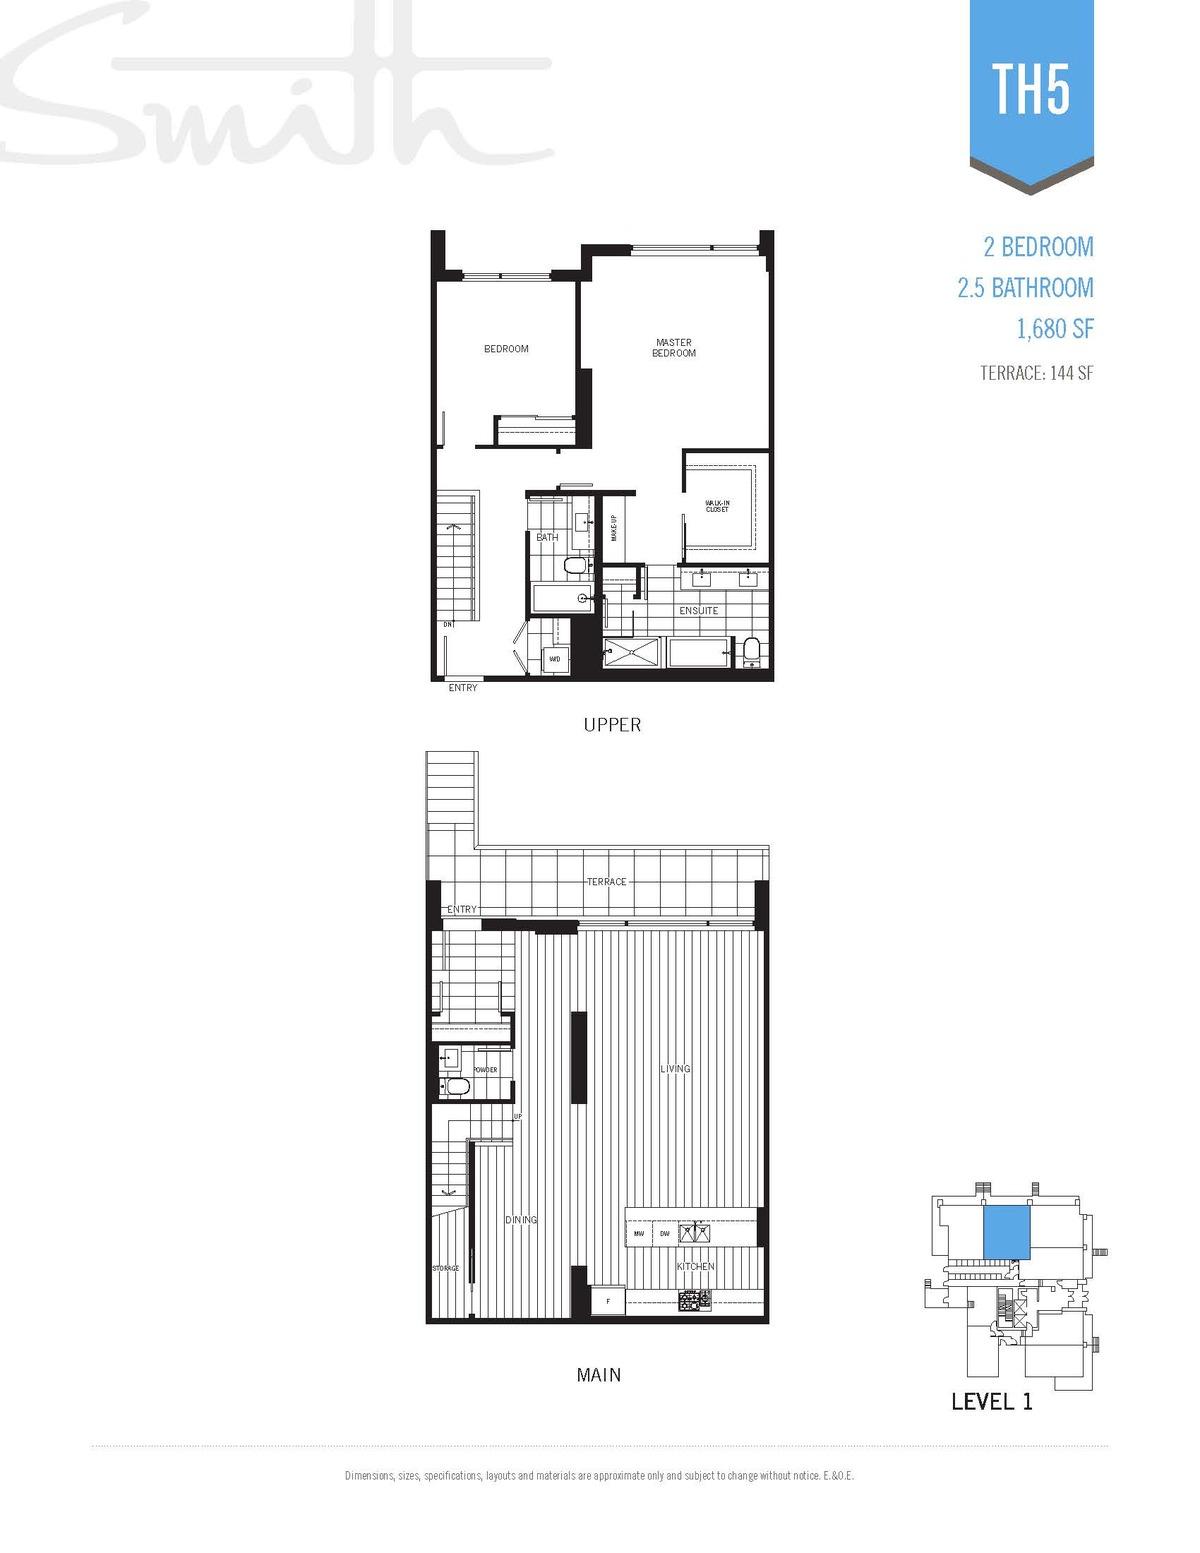 Smith Floorplan TH5